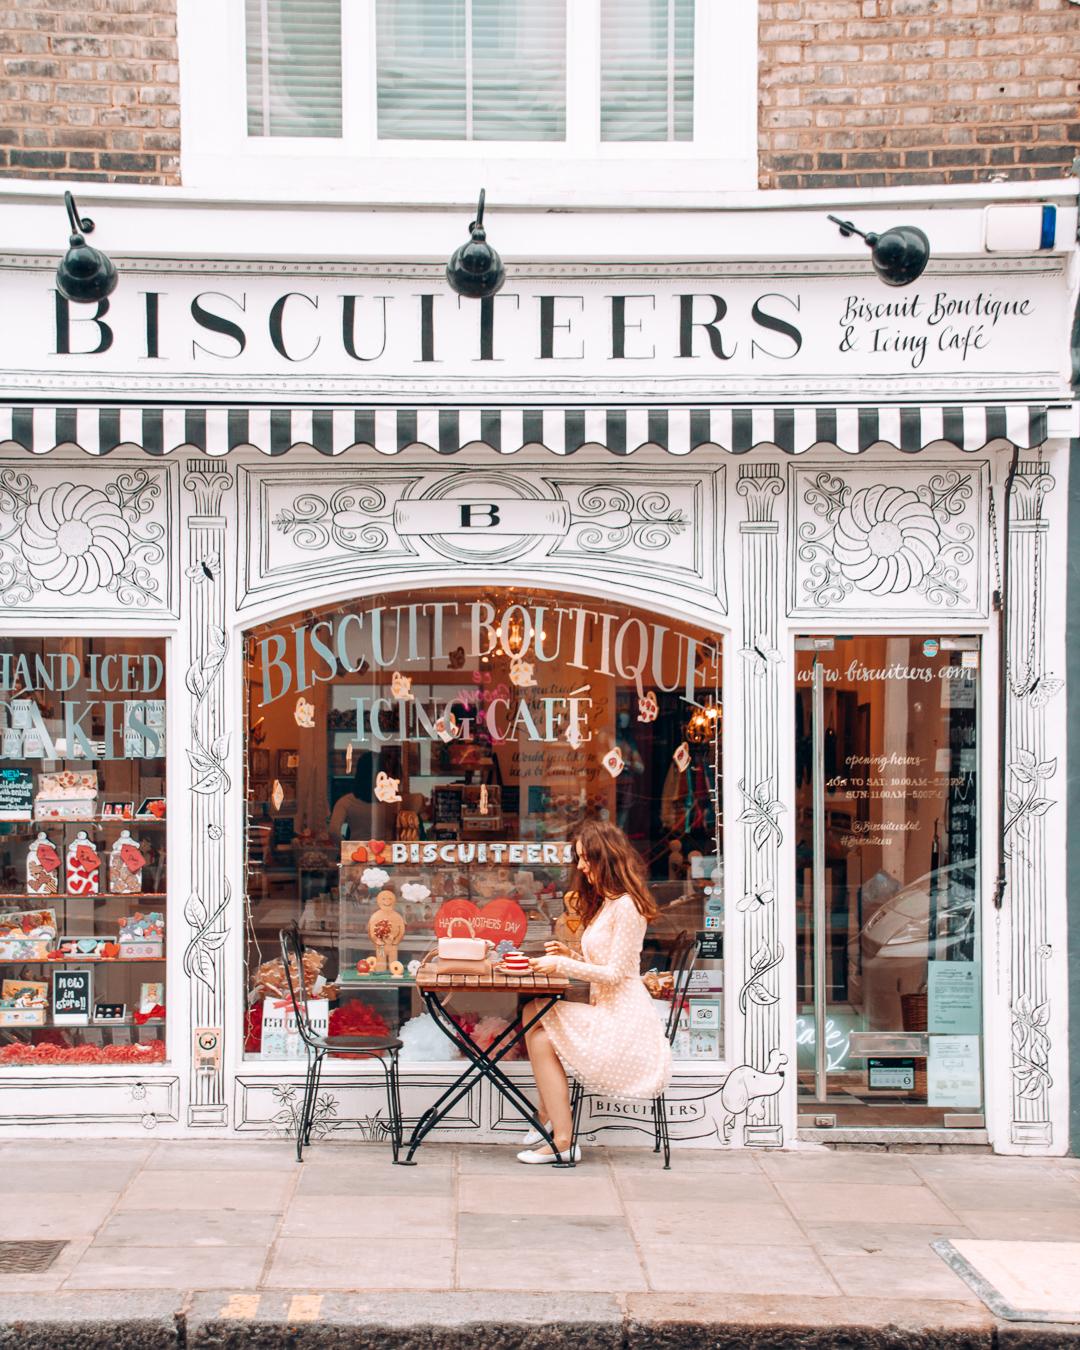 Biscuiteers in London